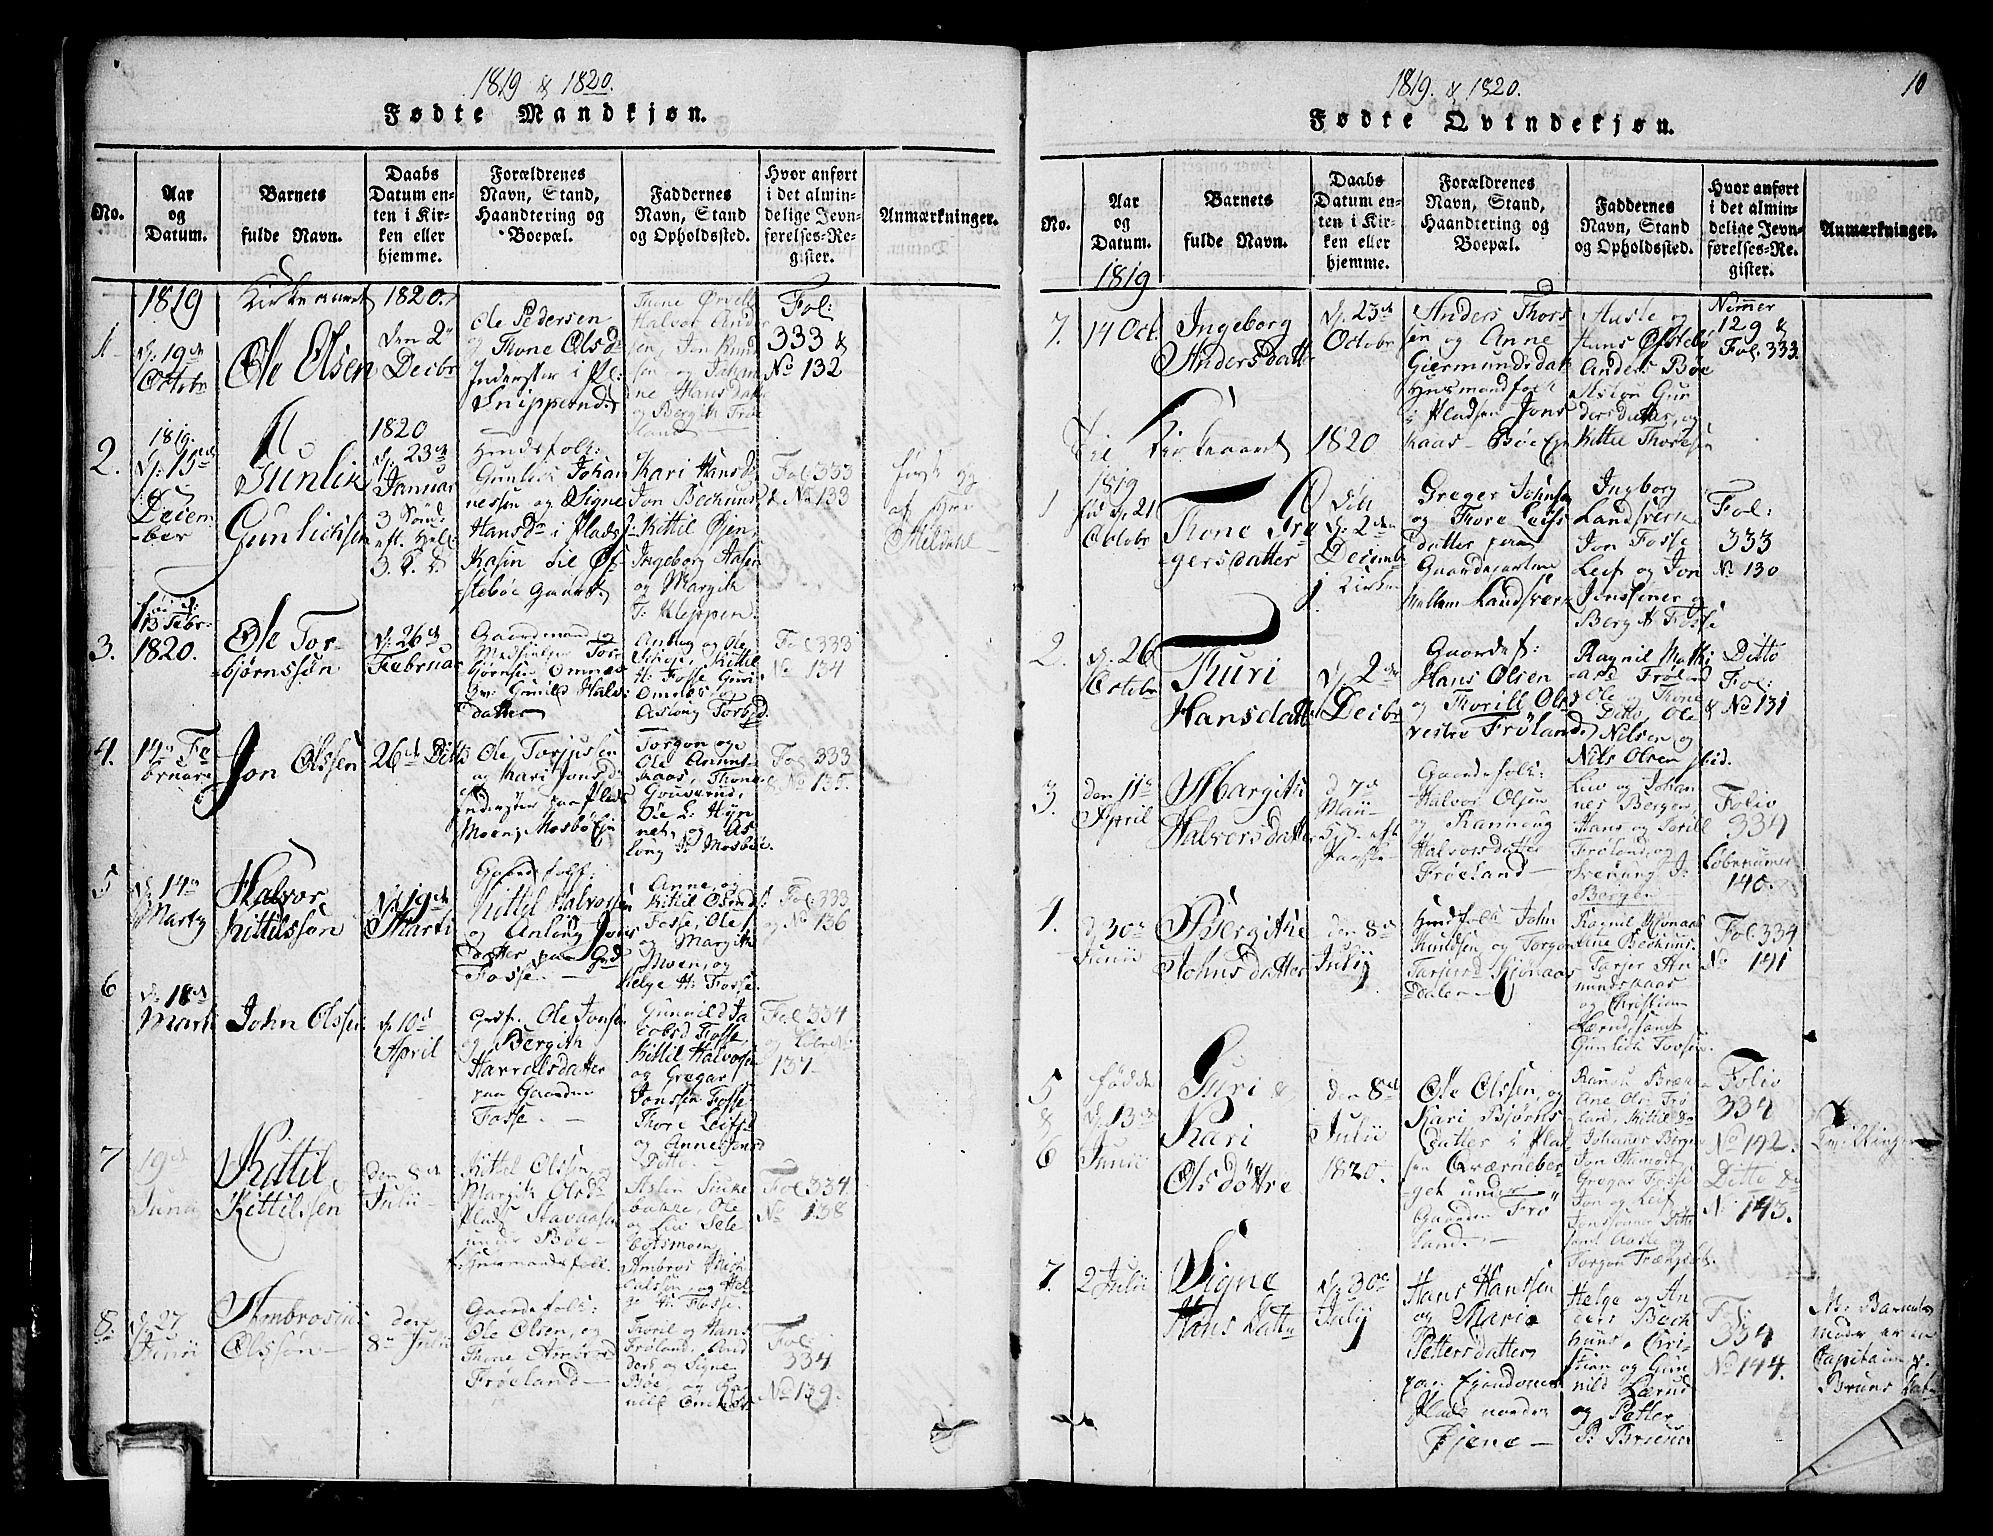 SAKO, Hjartdal kirkebøker, G/Gb/L0001: Klokkerbok nr. II 1, 1815-1842, s. 10